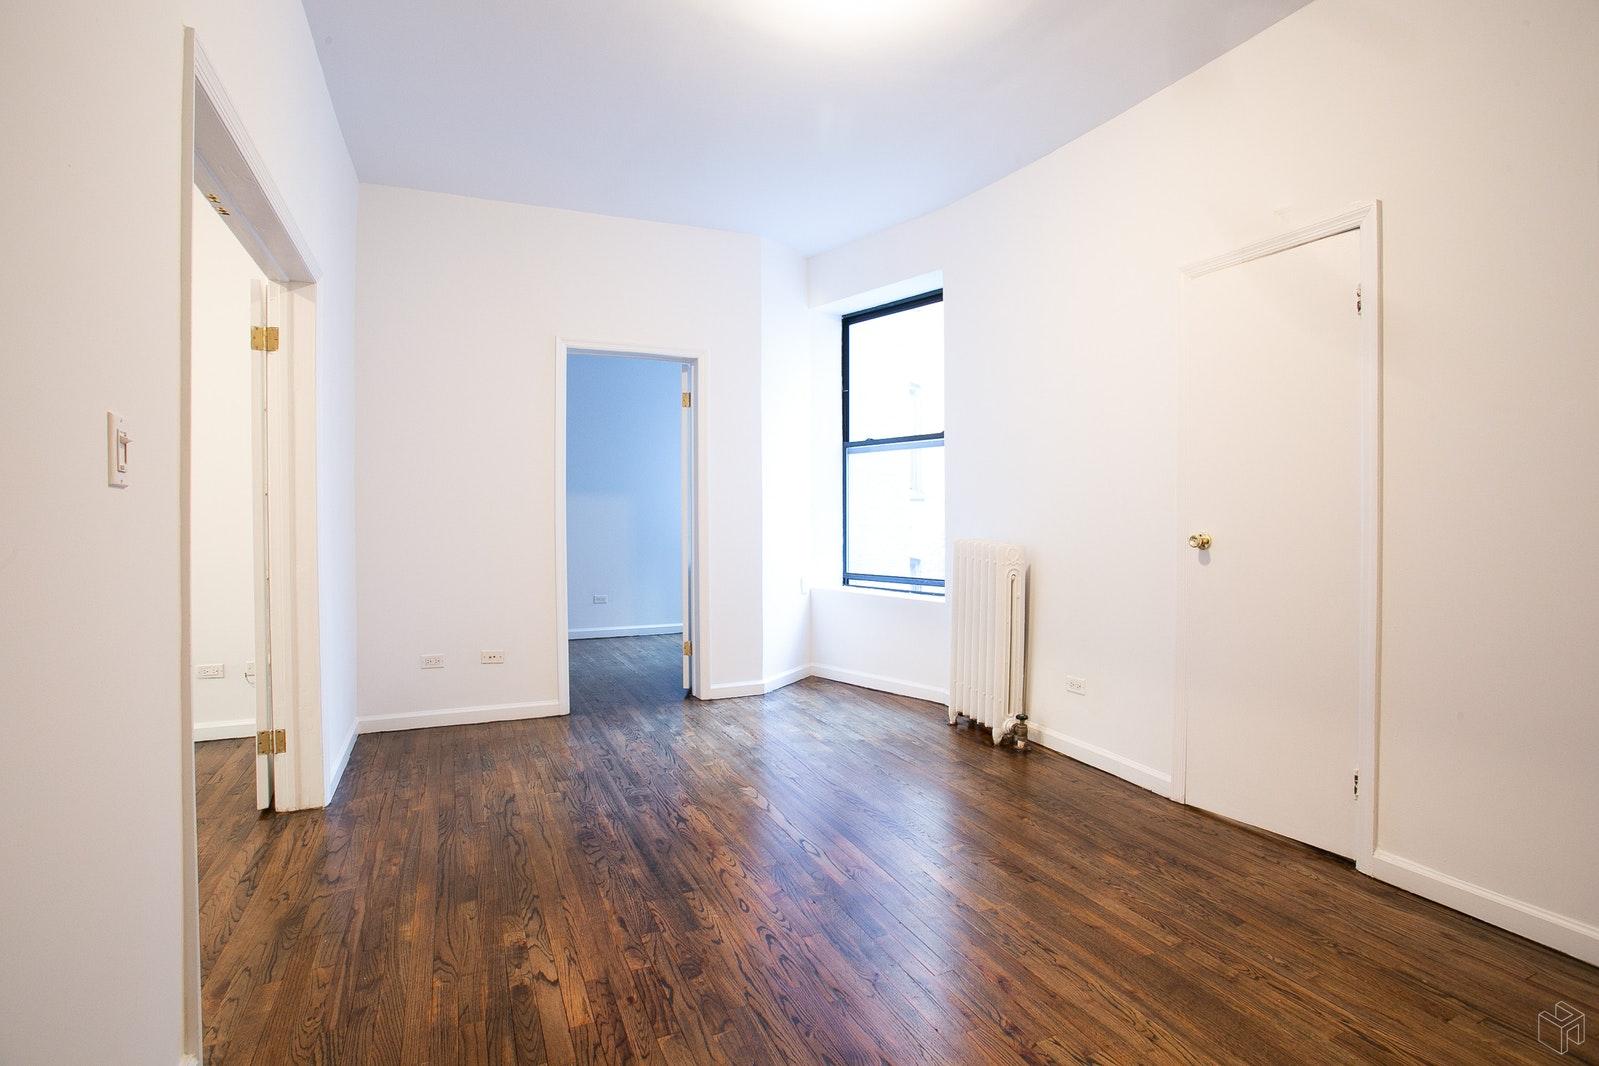 203 WEST 94TH STREET 2C, Upper West Side, $3,300, Web #: 19408135